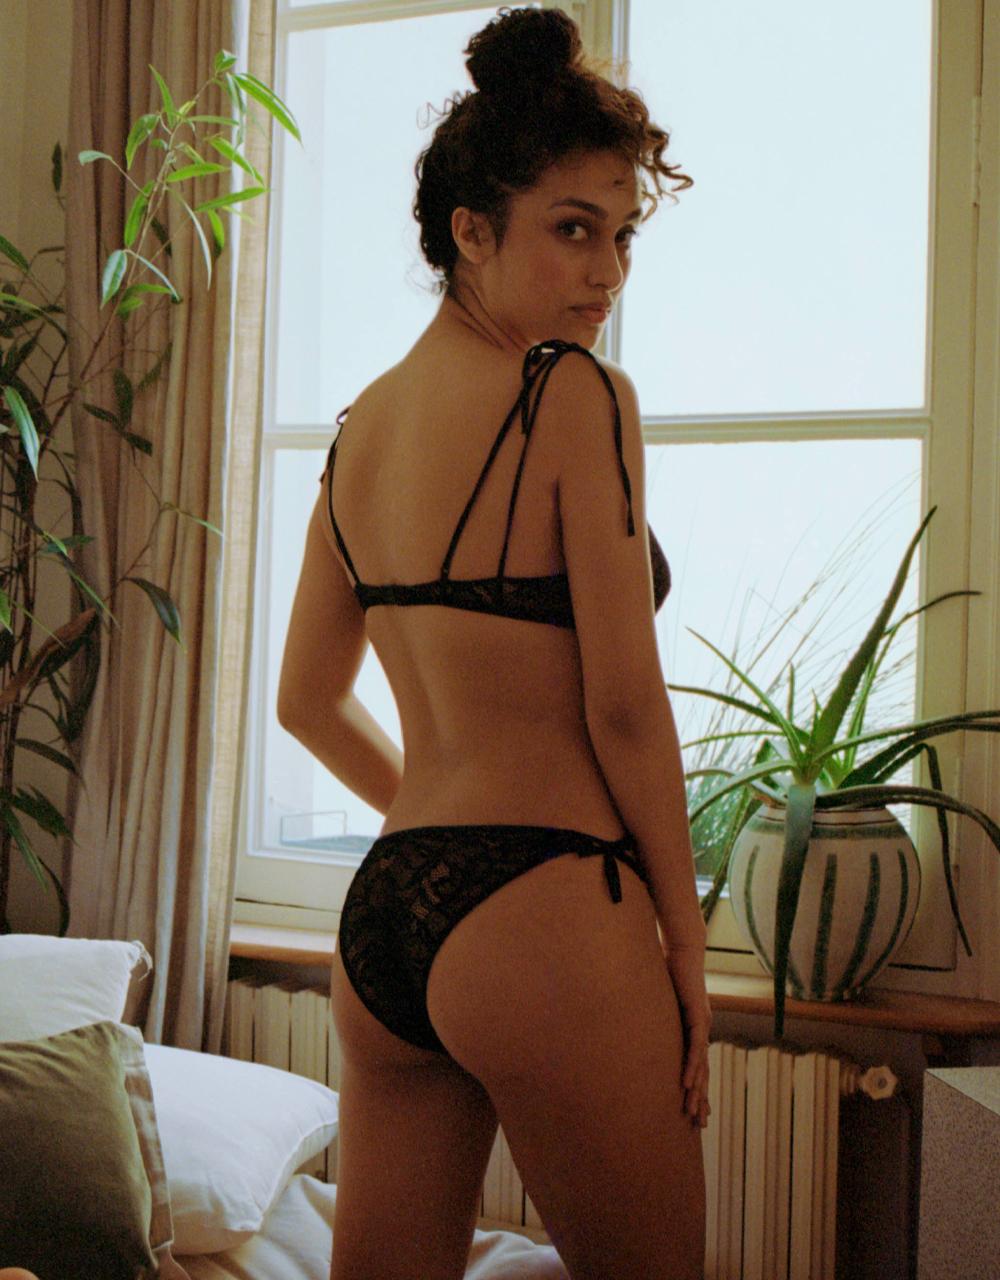 lingerie culotte Black Tie Noir Forever 19 € Girls In Paris photo 3